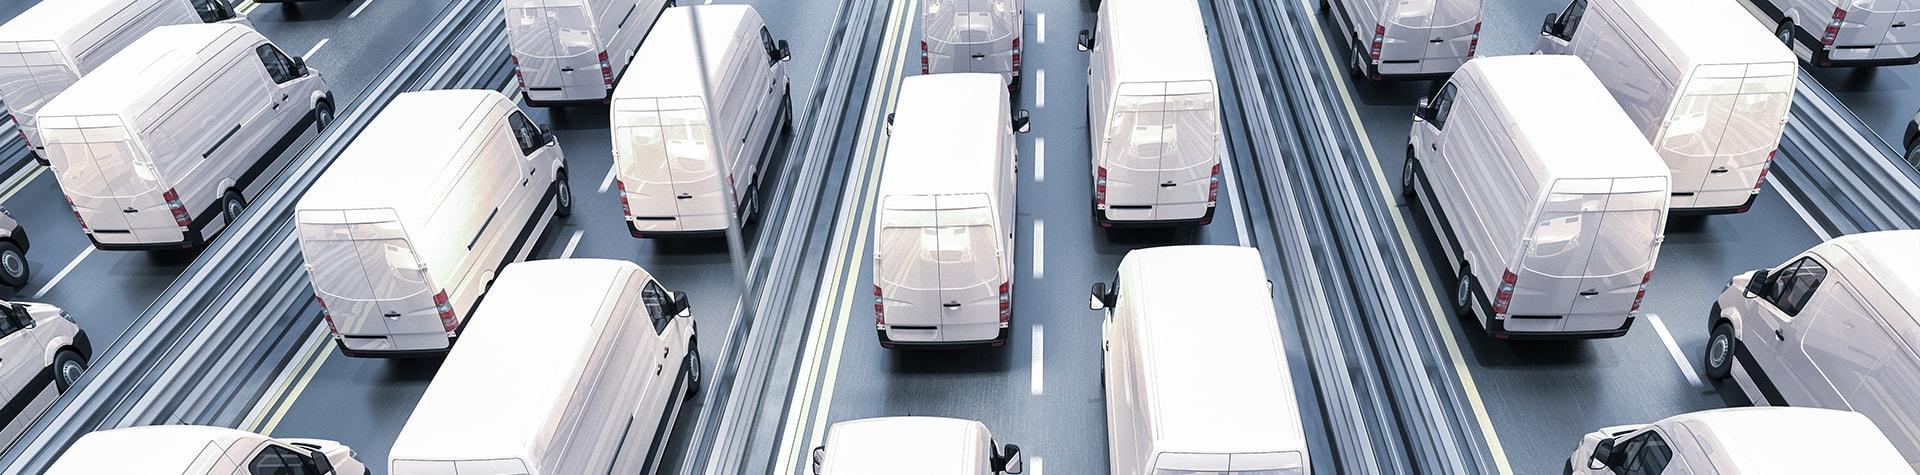 Monitorizare auto prin GPS pentru distributie | evogps.ro